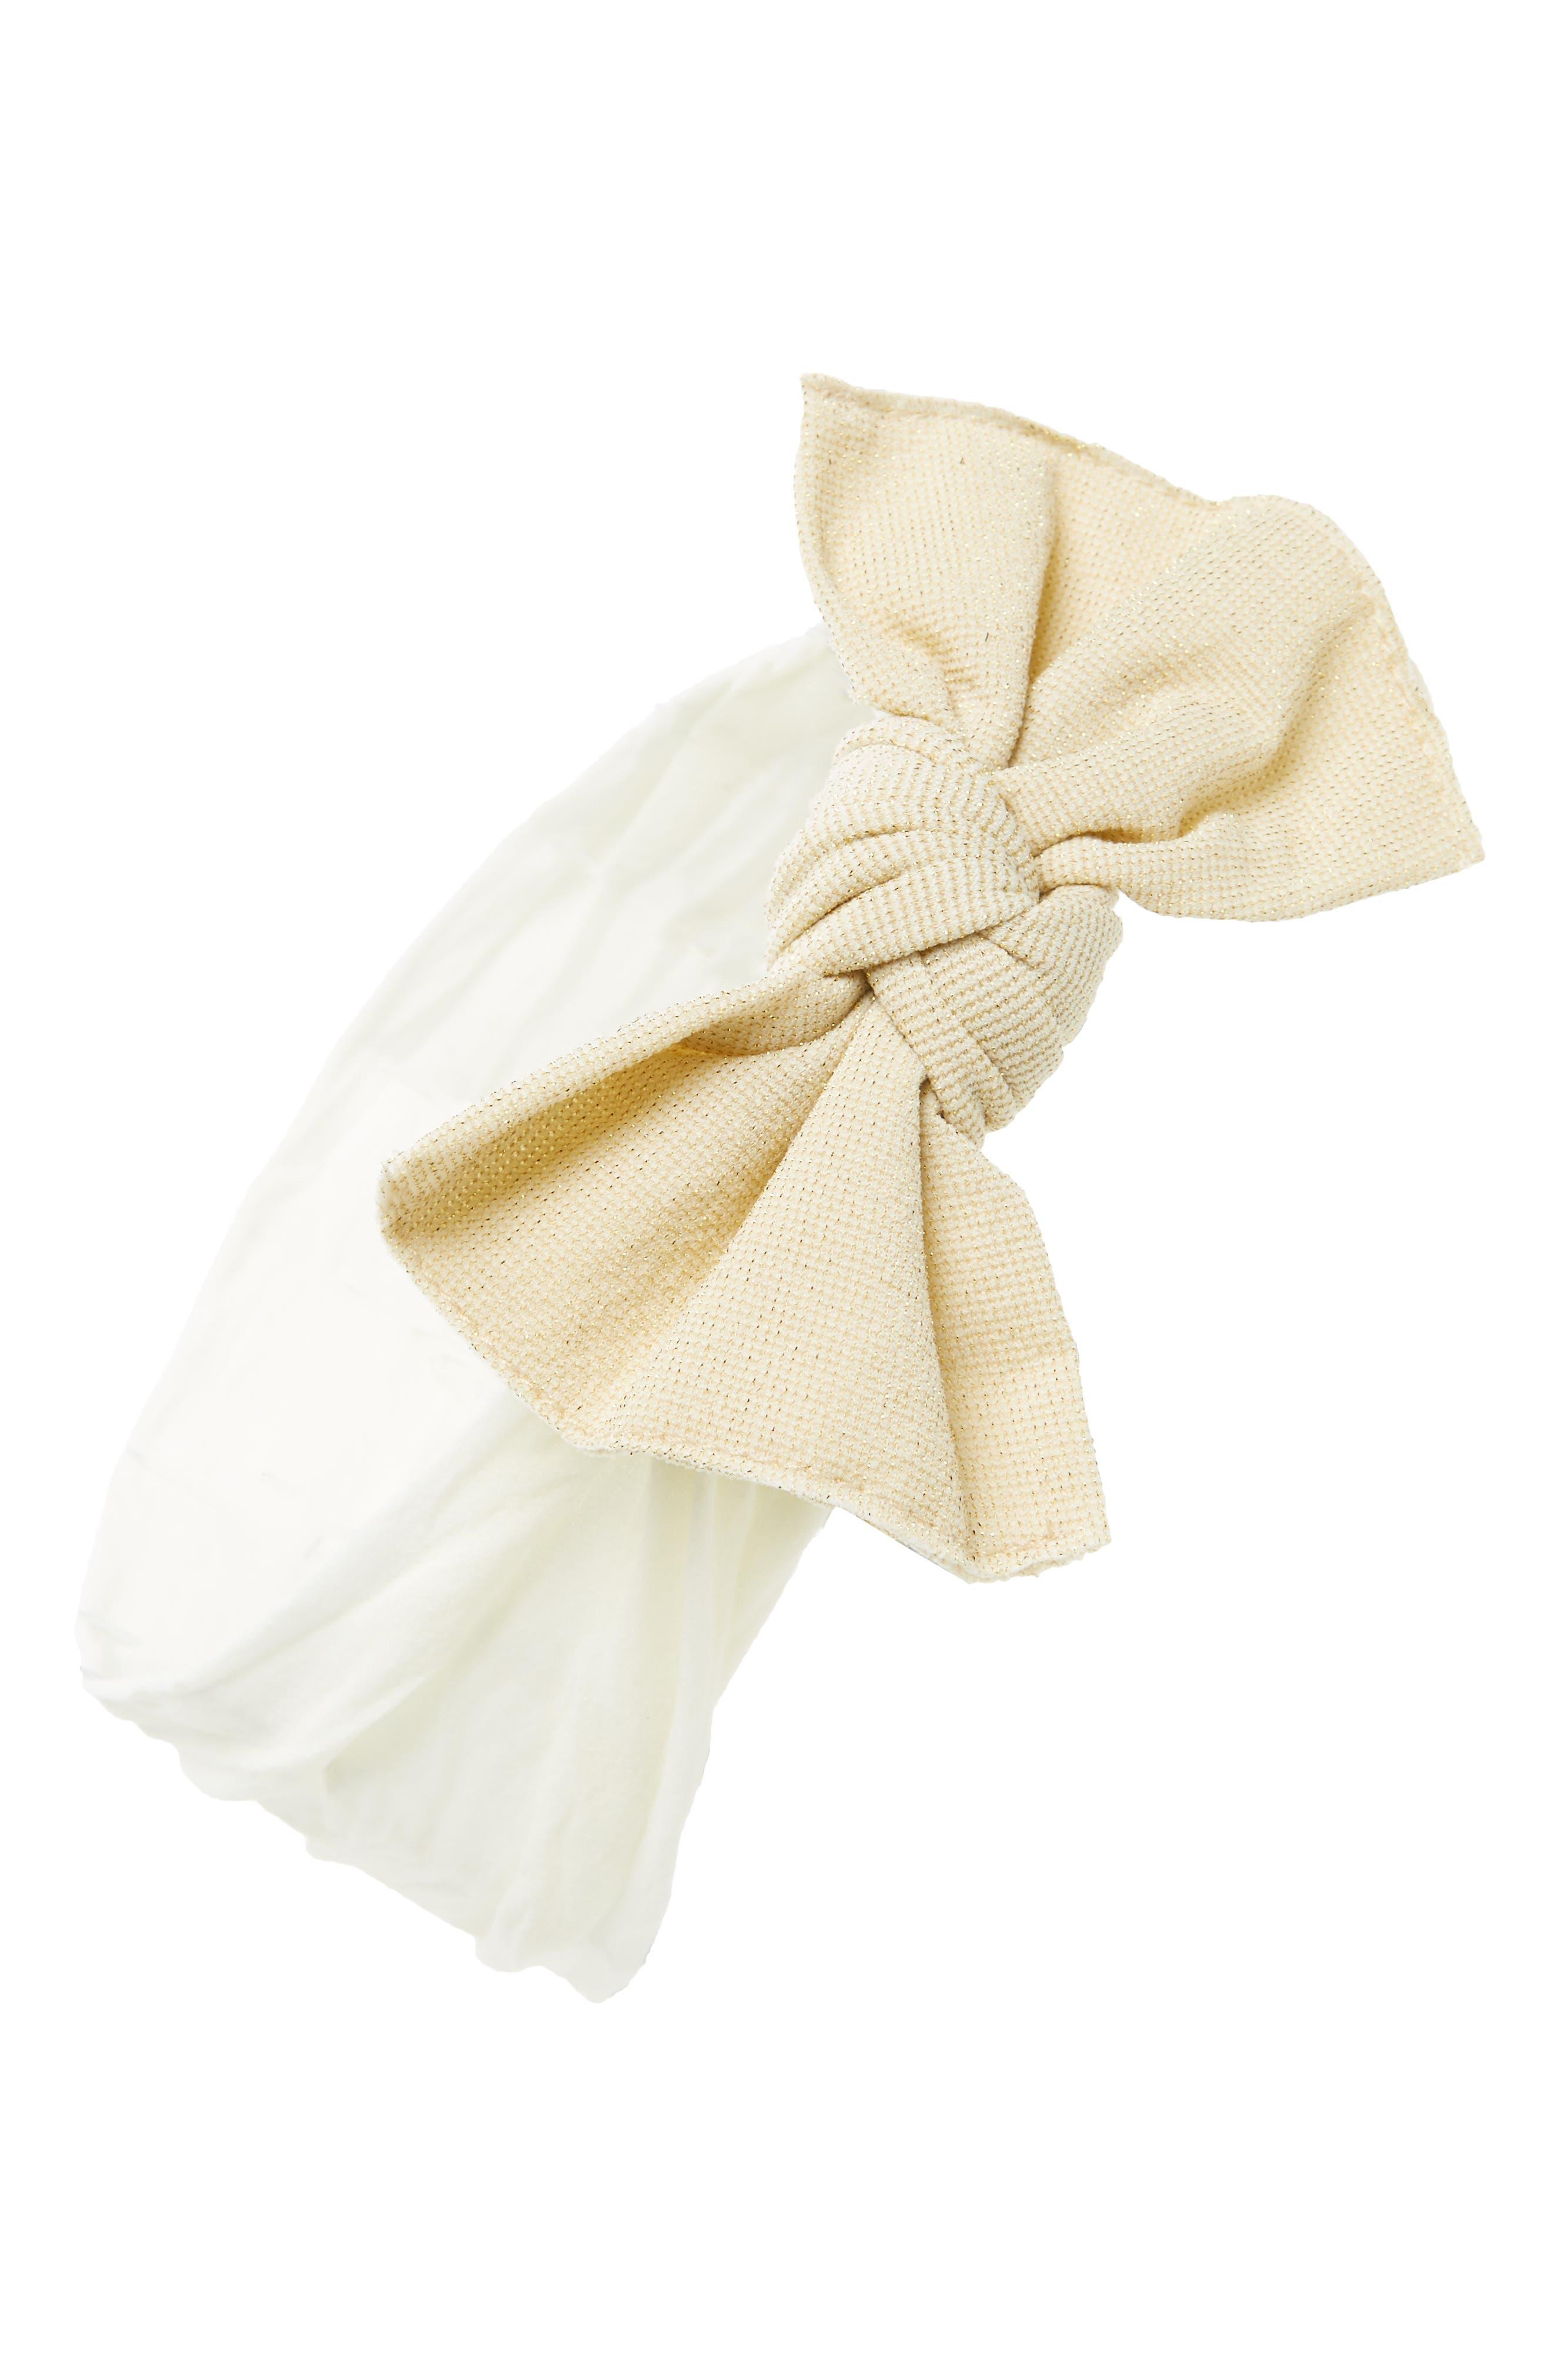 Metallic Knot Bow Headband,                         Main,                         color, White/ Silver